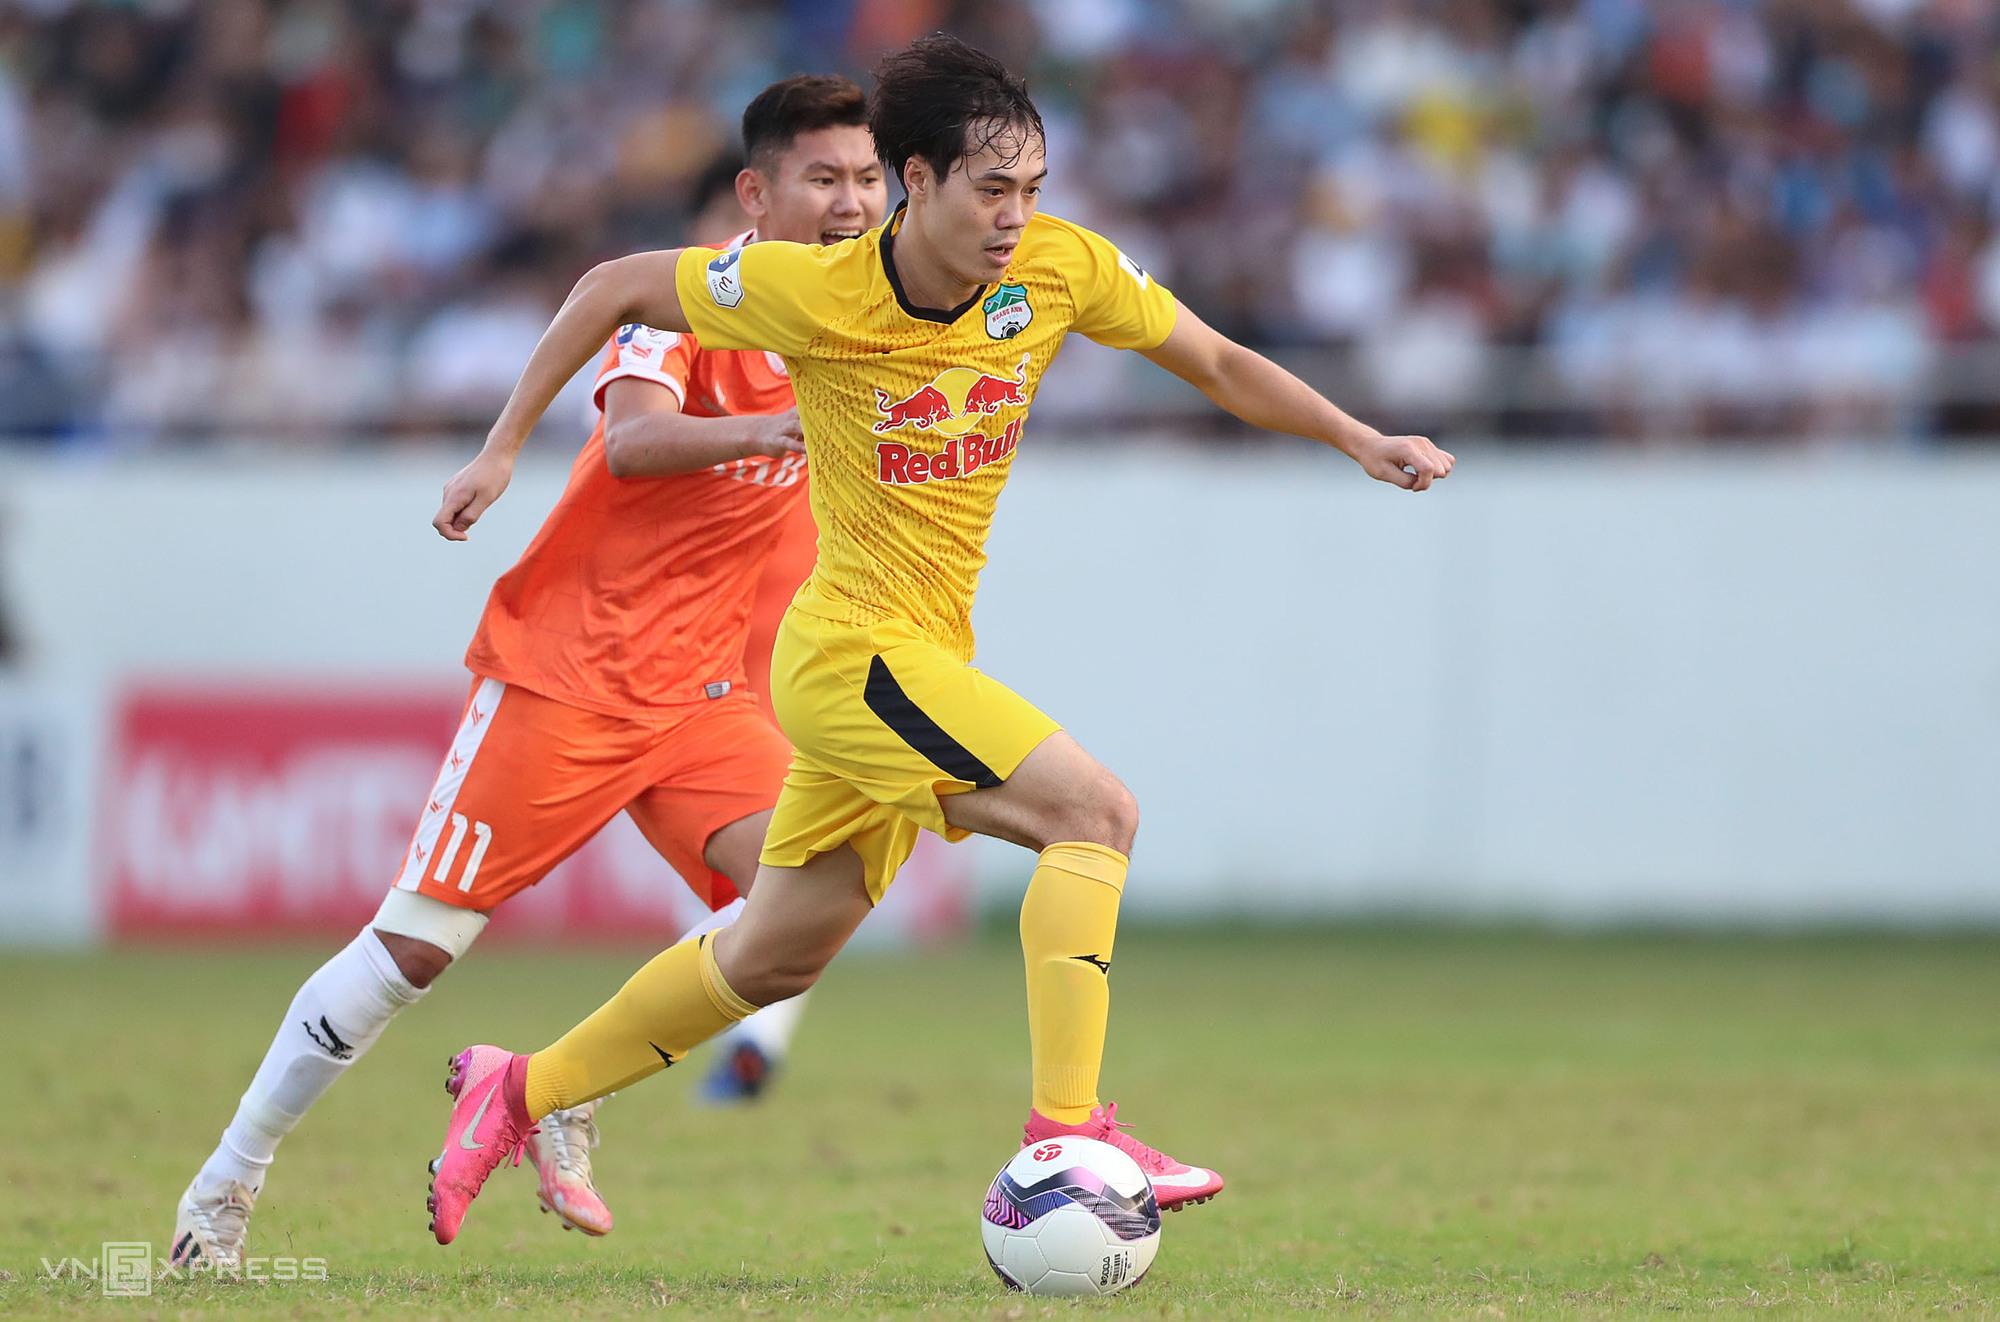 Van Toan ยิงประตูโดยเฉลี่ยหนึ่งประตูต่อเกมใน V-League ฤดูกาลนี้  ภาพ: Duc Dong